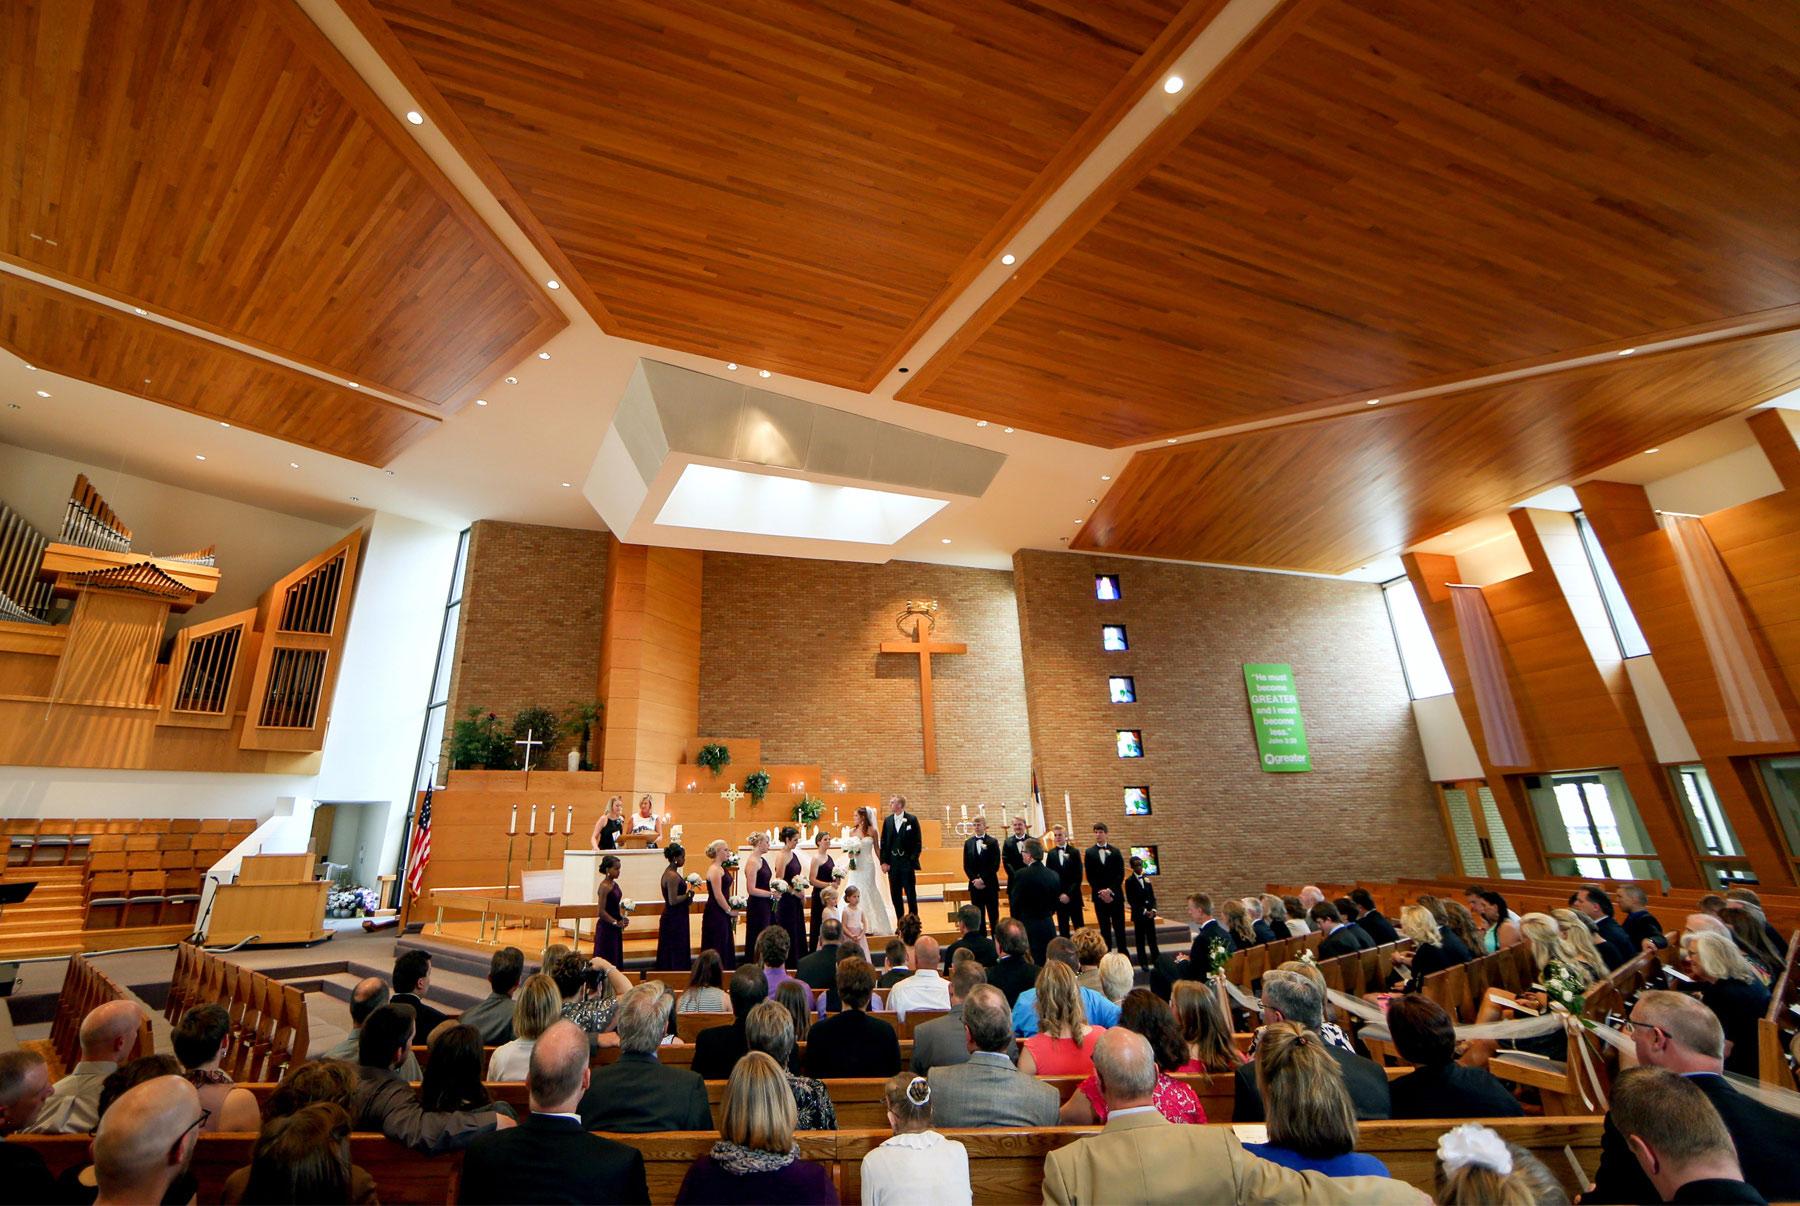 07-Minneapolis-Minnesota-Wedding-Photography-by-Vick-Photography-Ceremony-Woodbury-Lutheran-Church-Tianna-&-Matt.jpg